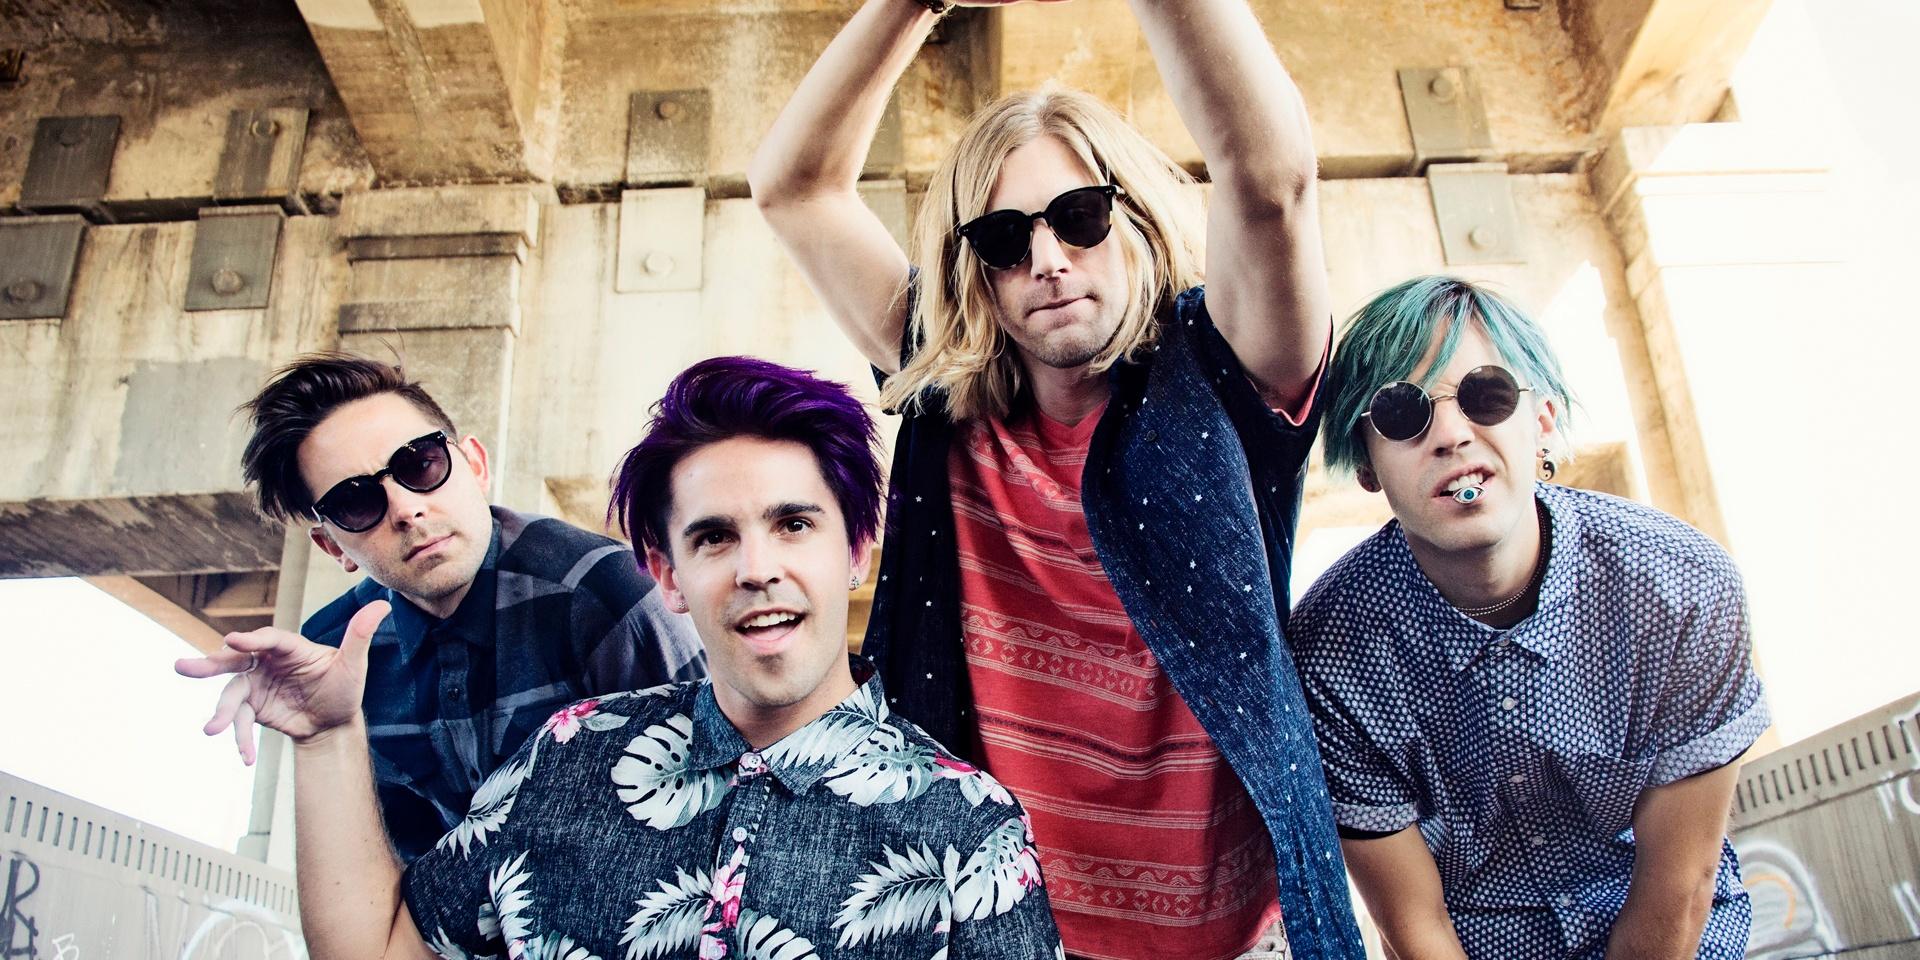 ALBUM REVIEW: New Beat Fund - Sponge Fingerz